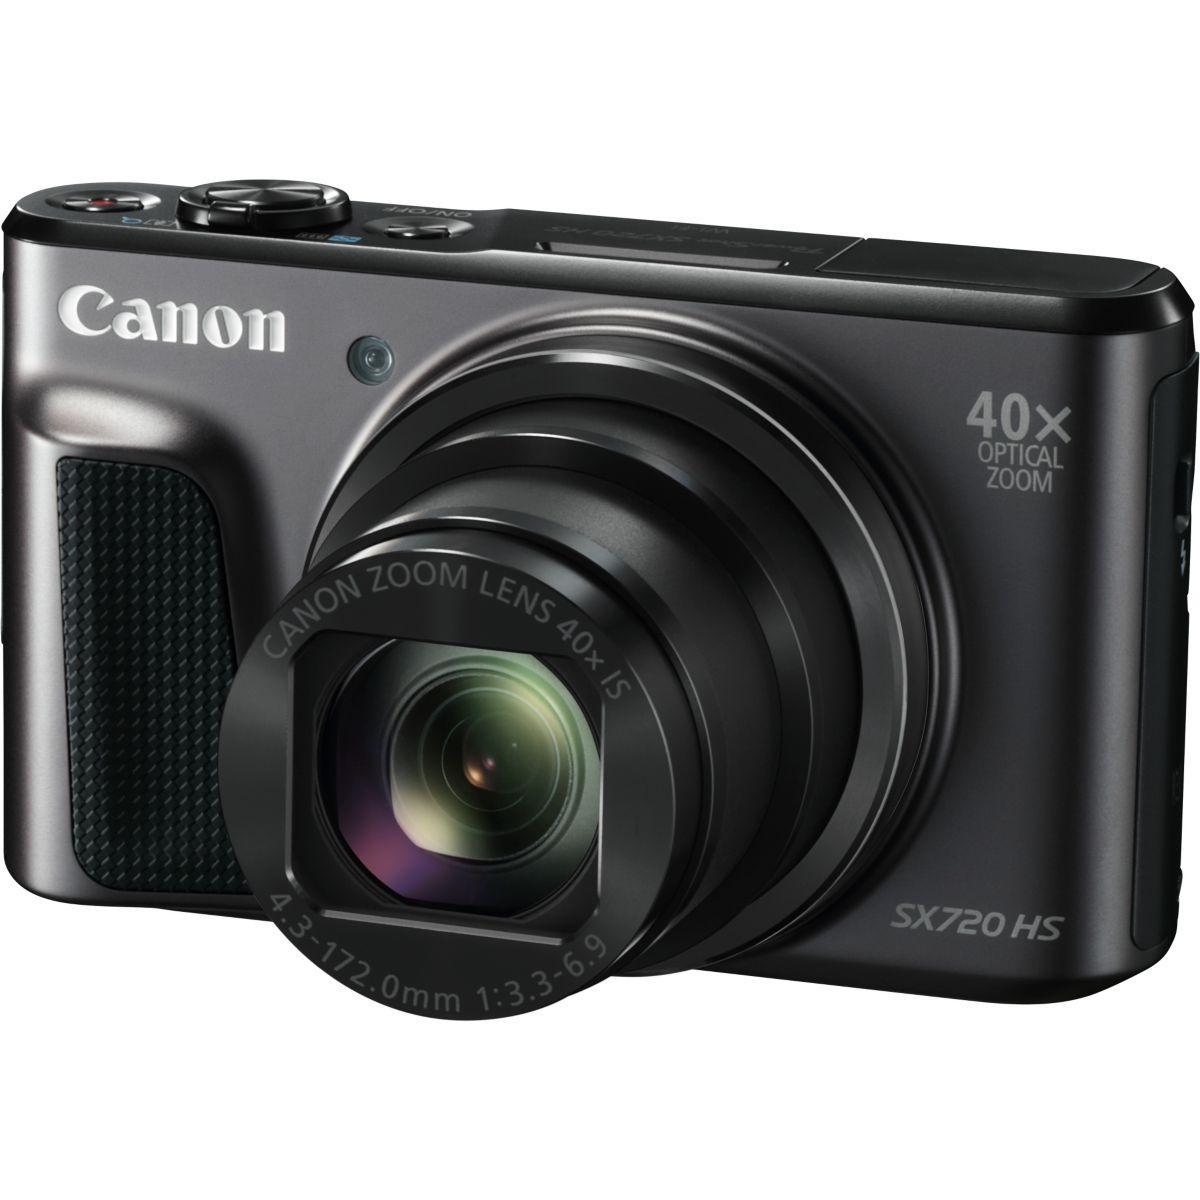 Appareil photo compact canon sx720 hs noir (photo)